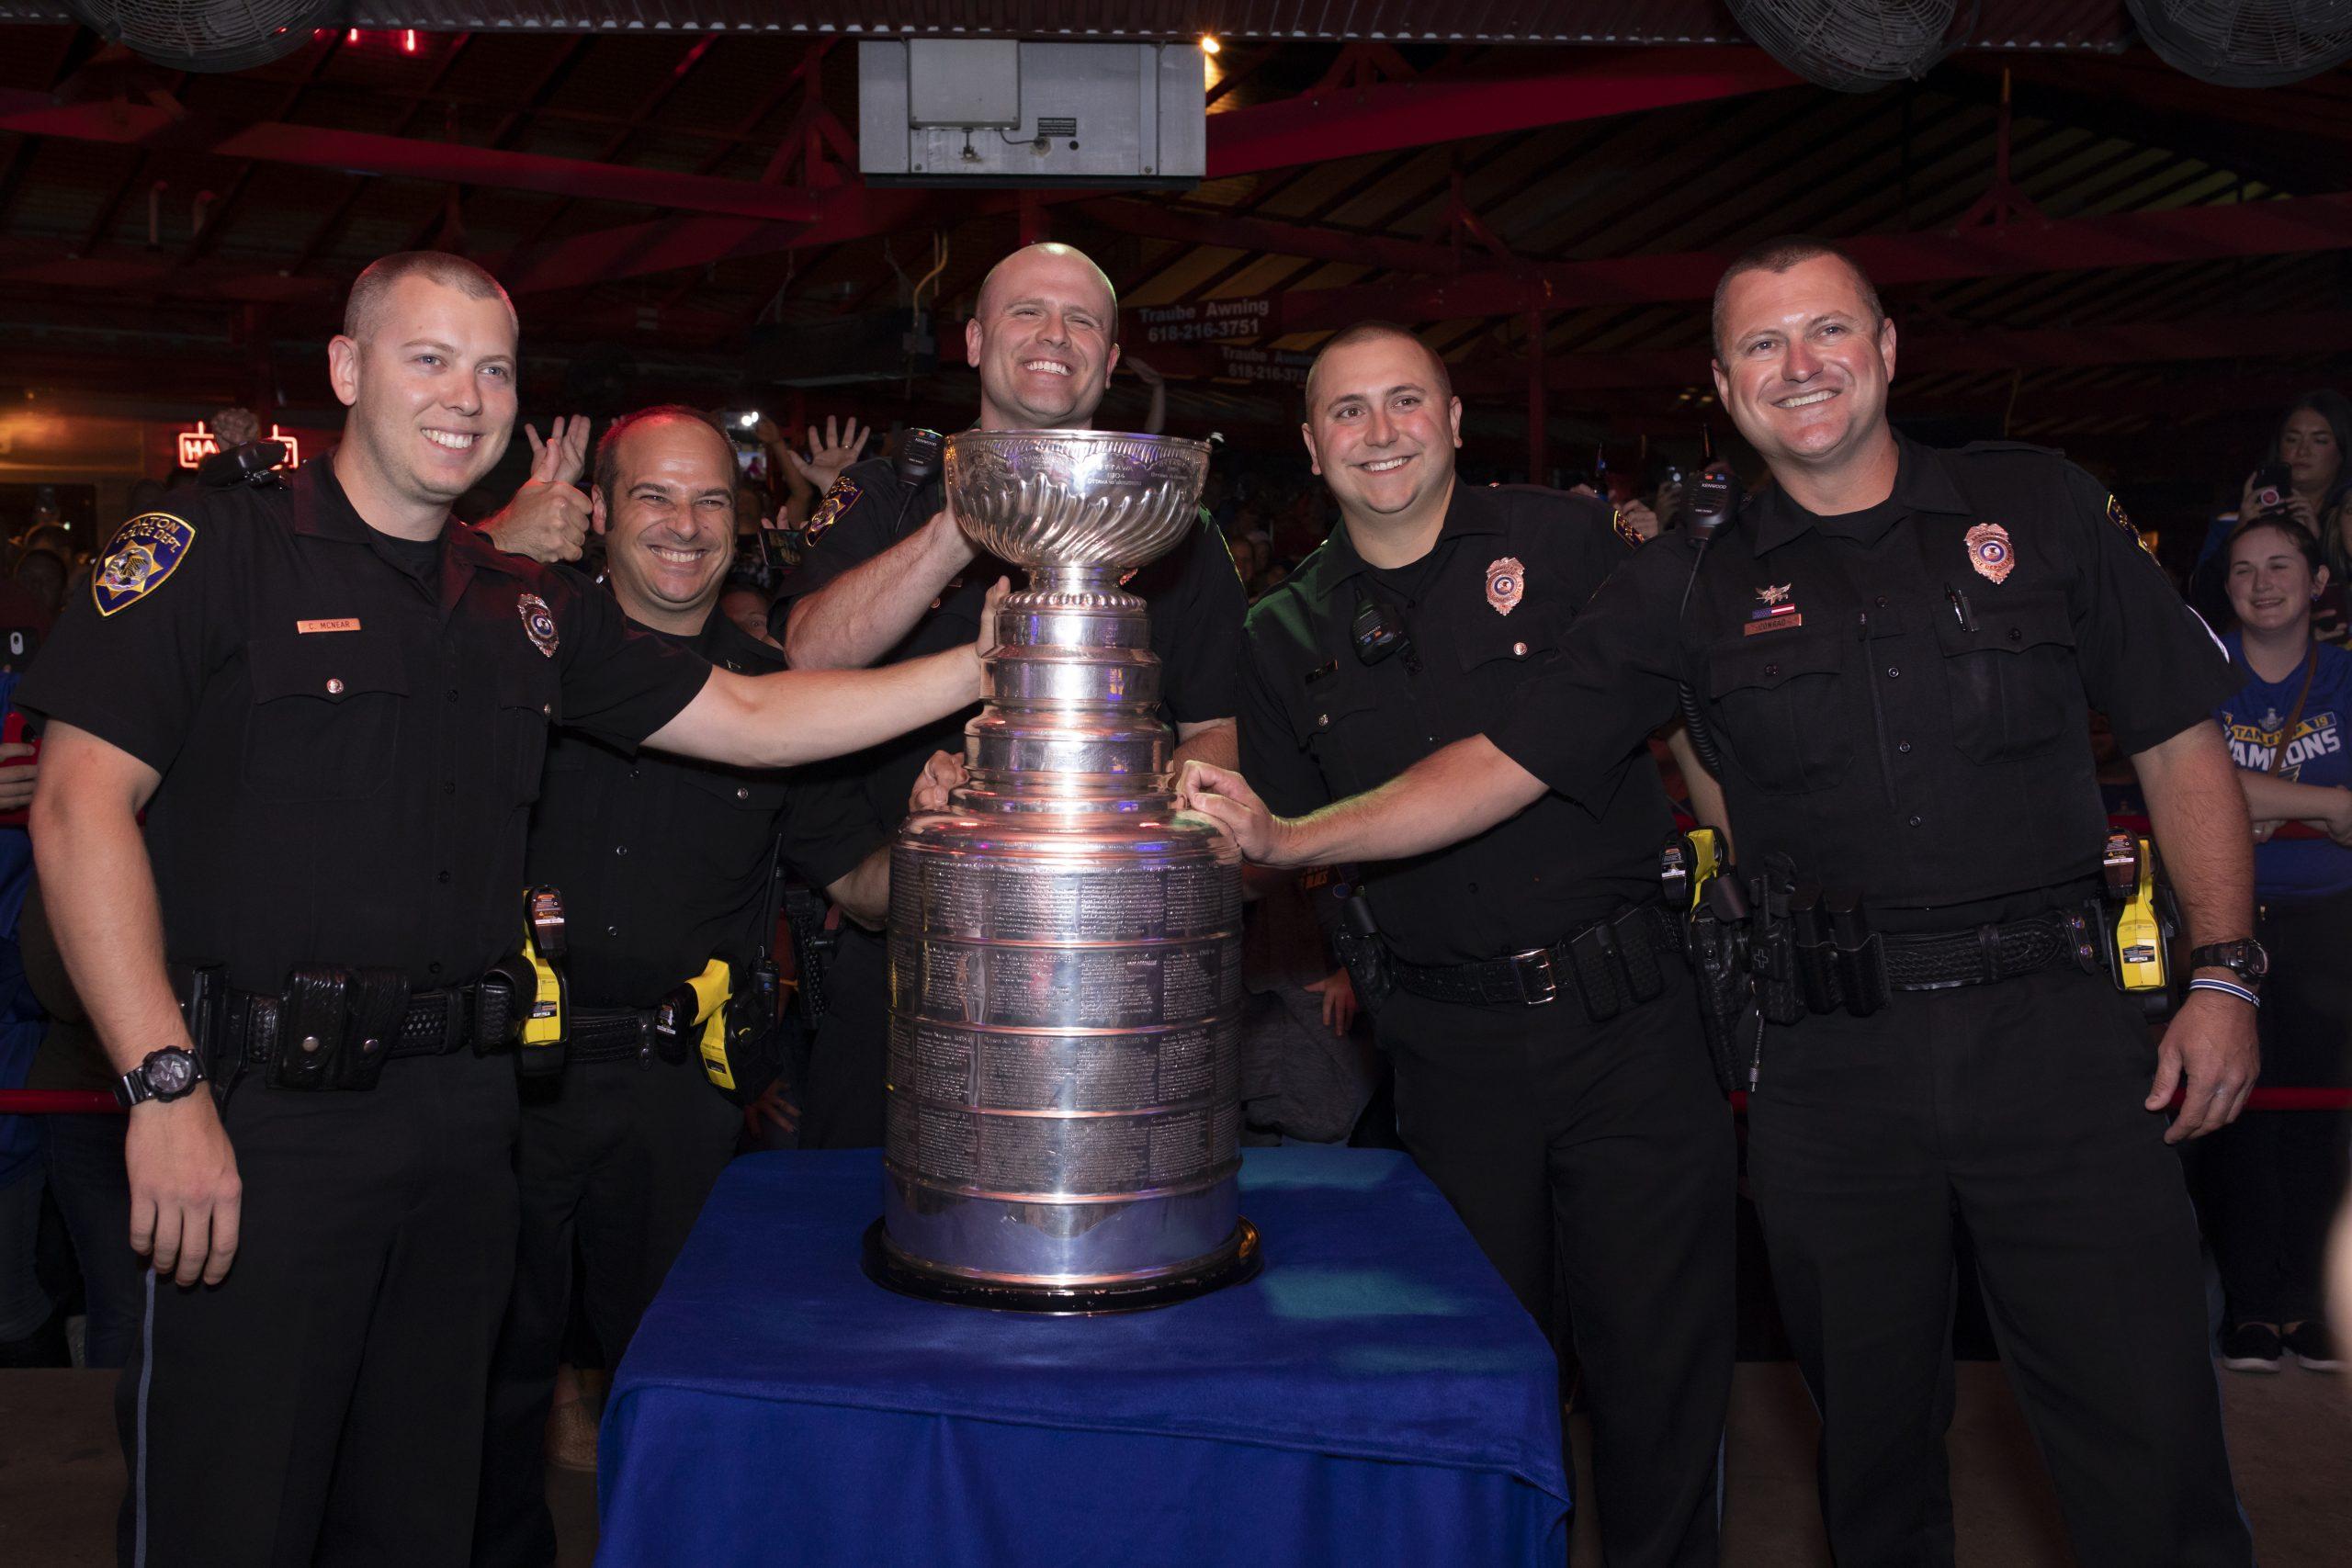 fast-eddies-bon-air-cops-and-stanley-cup